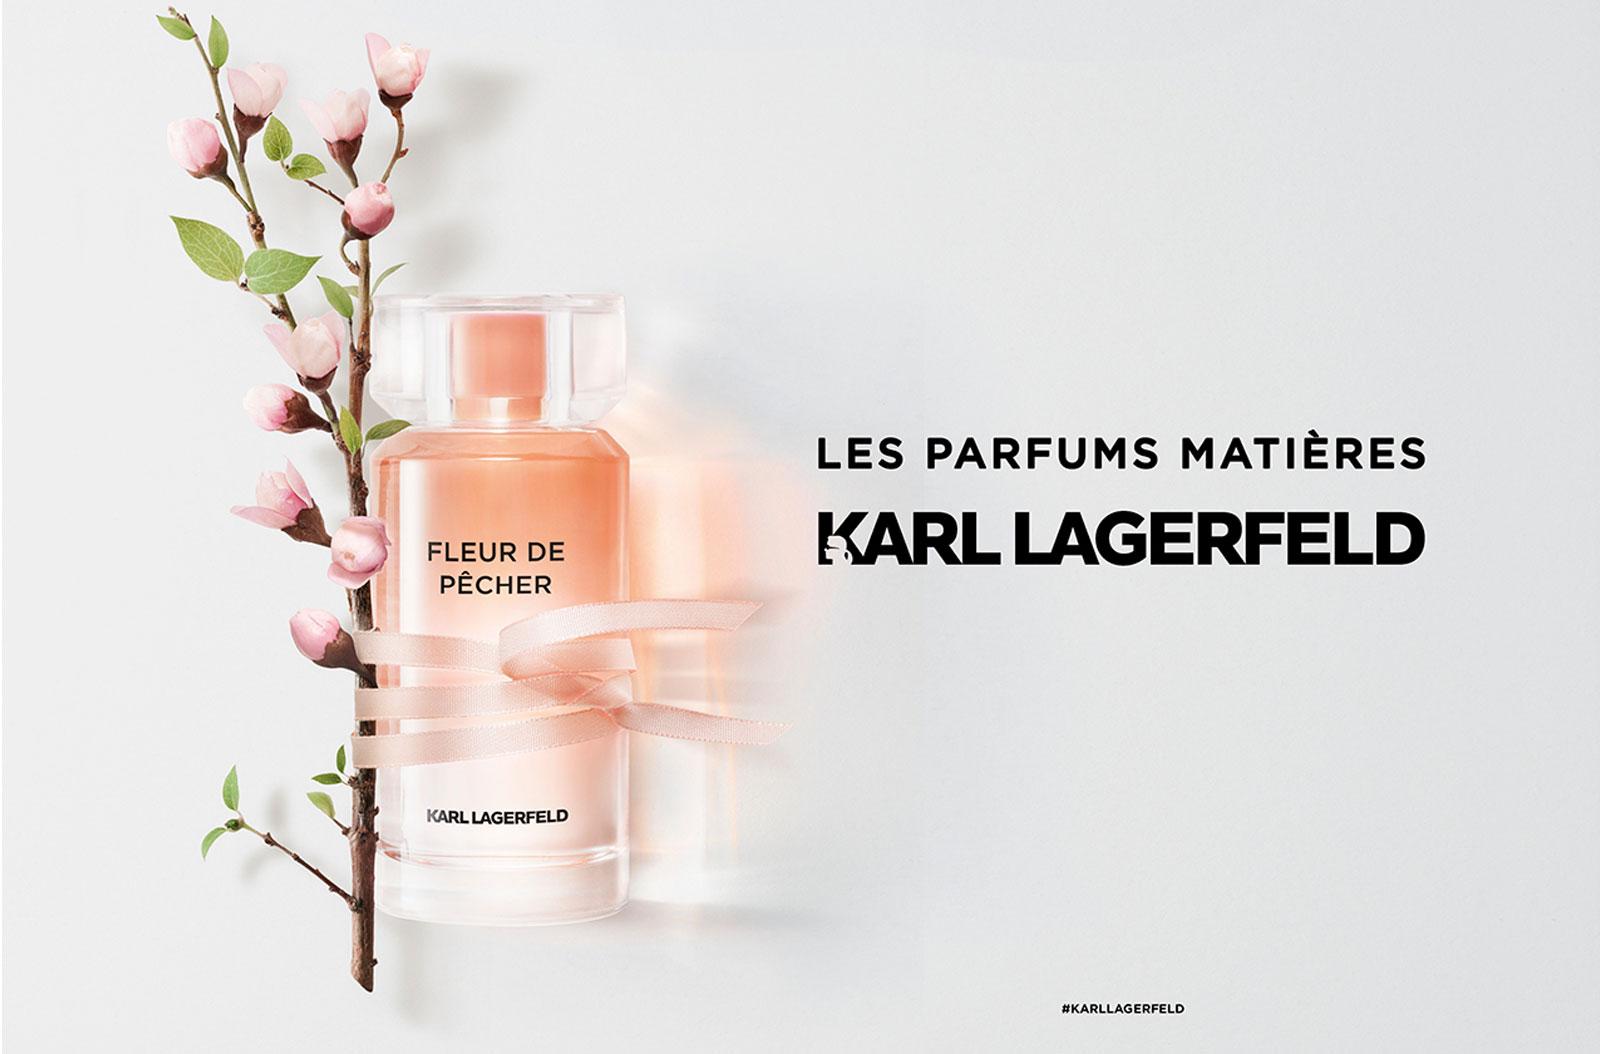 Karl Lagerfeld Les Parfums Matières